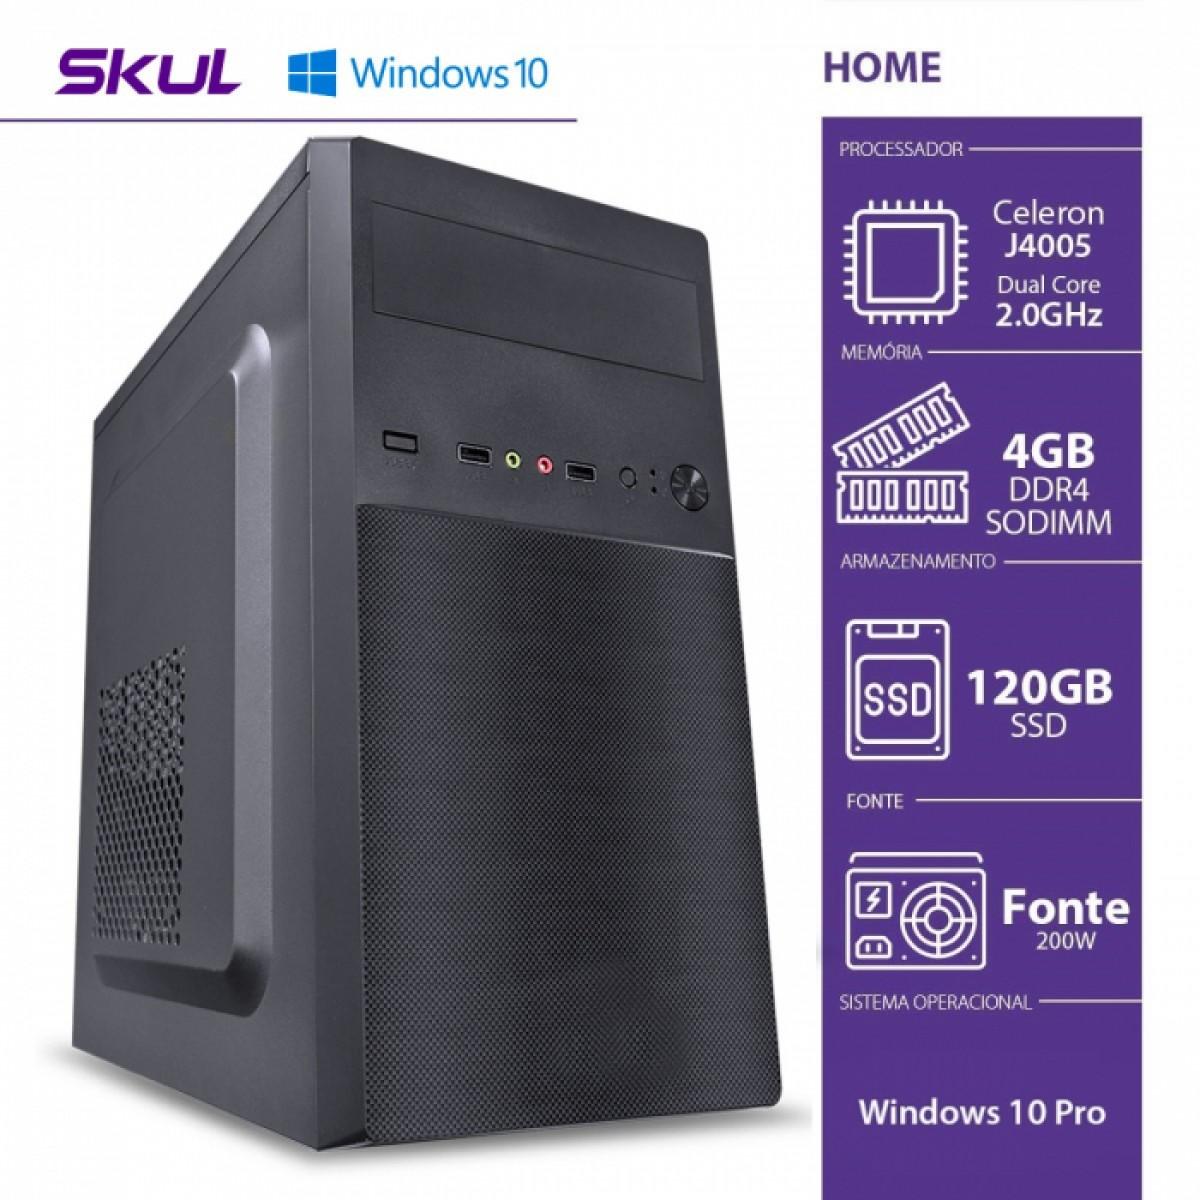 Computador Skul T-Home H100 CELERON DUAL CORE J4005 / 4GB DDR4 SODIMM / SSD 120GB / HDMI/VGA / FONTE 200W / Windows 10 Pro